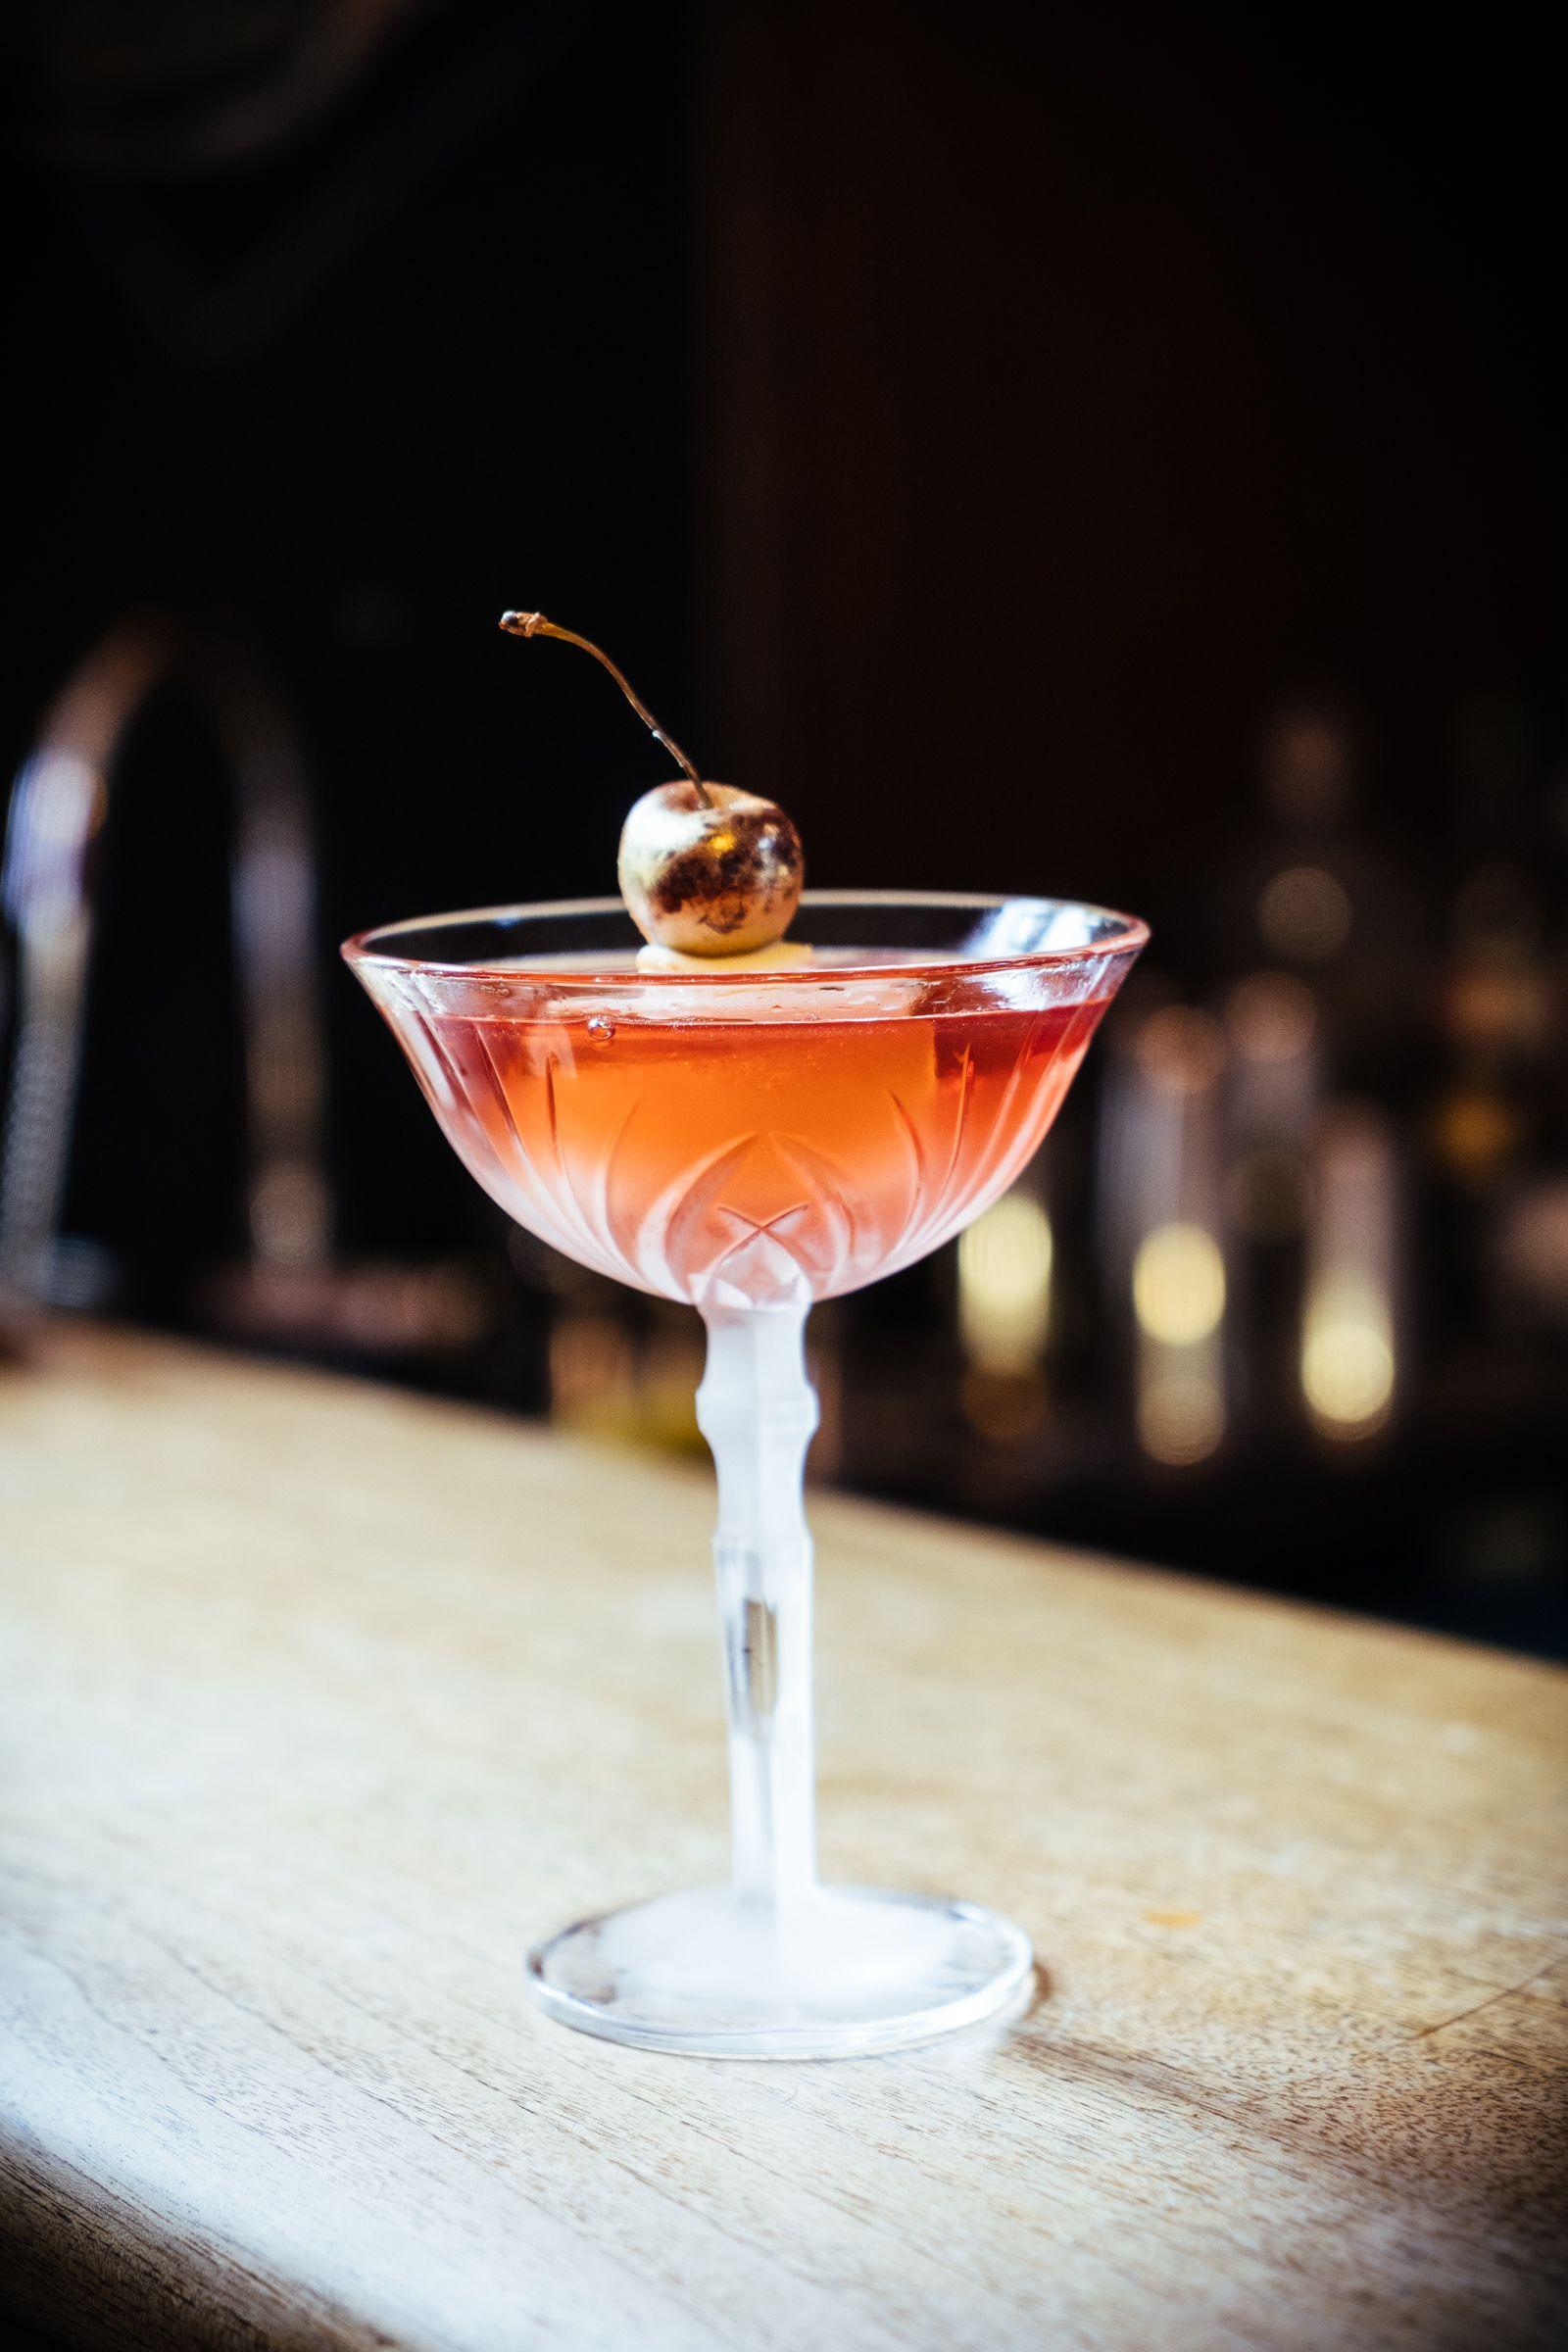 Grace_o_malley_signature_cocktail_-_bloody_cherry_by_benjamin_panek_pic_credit_dennis_dorwarth__1_